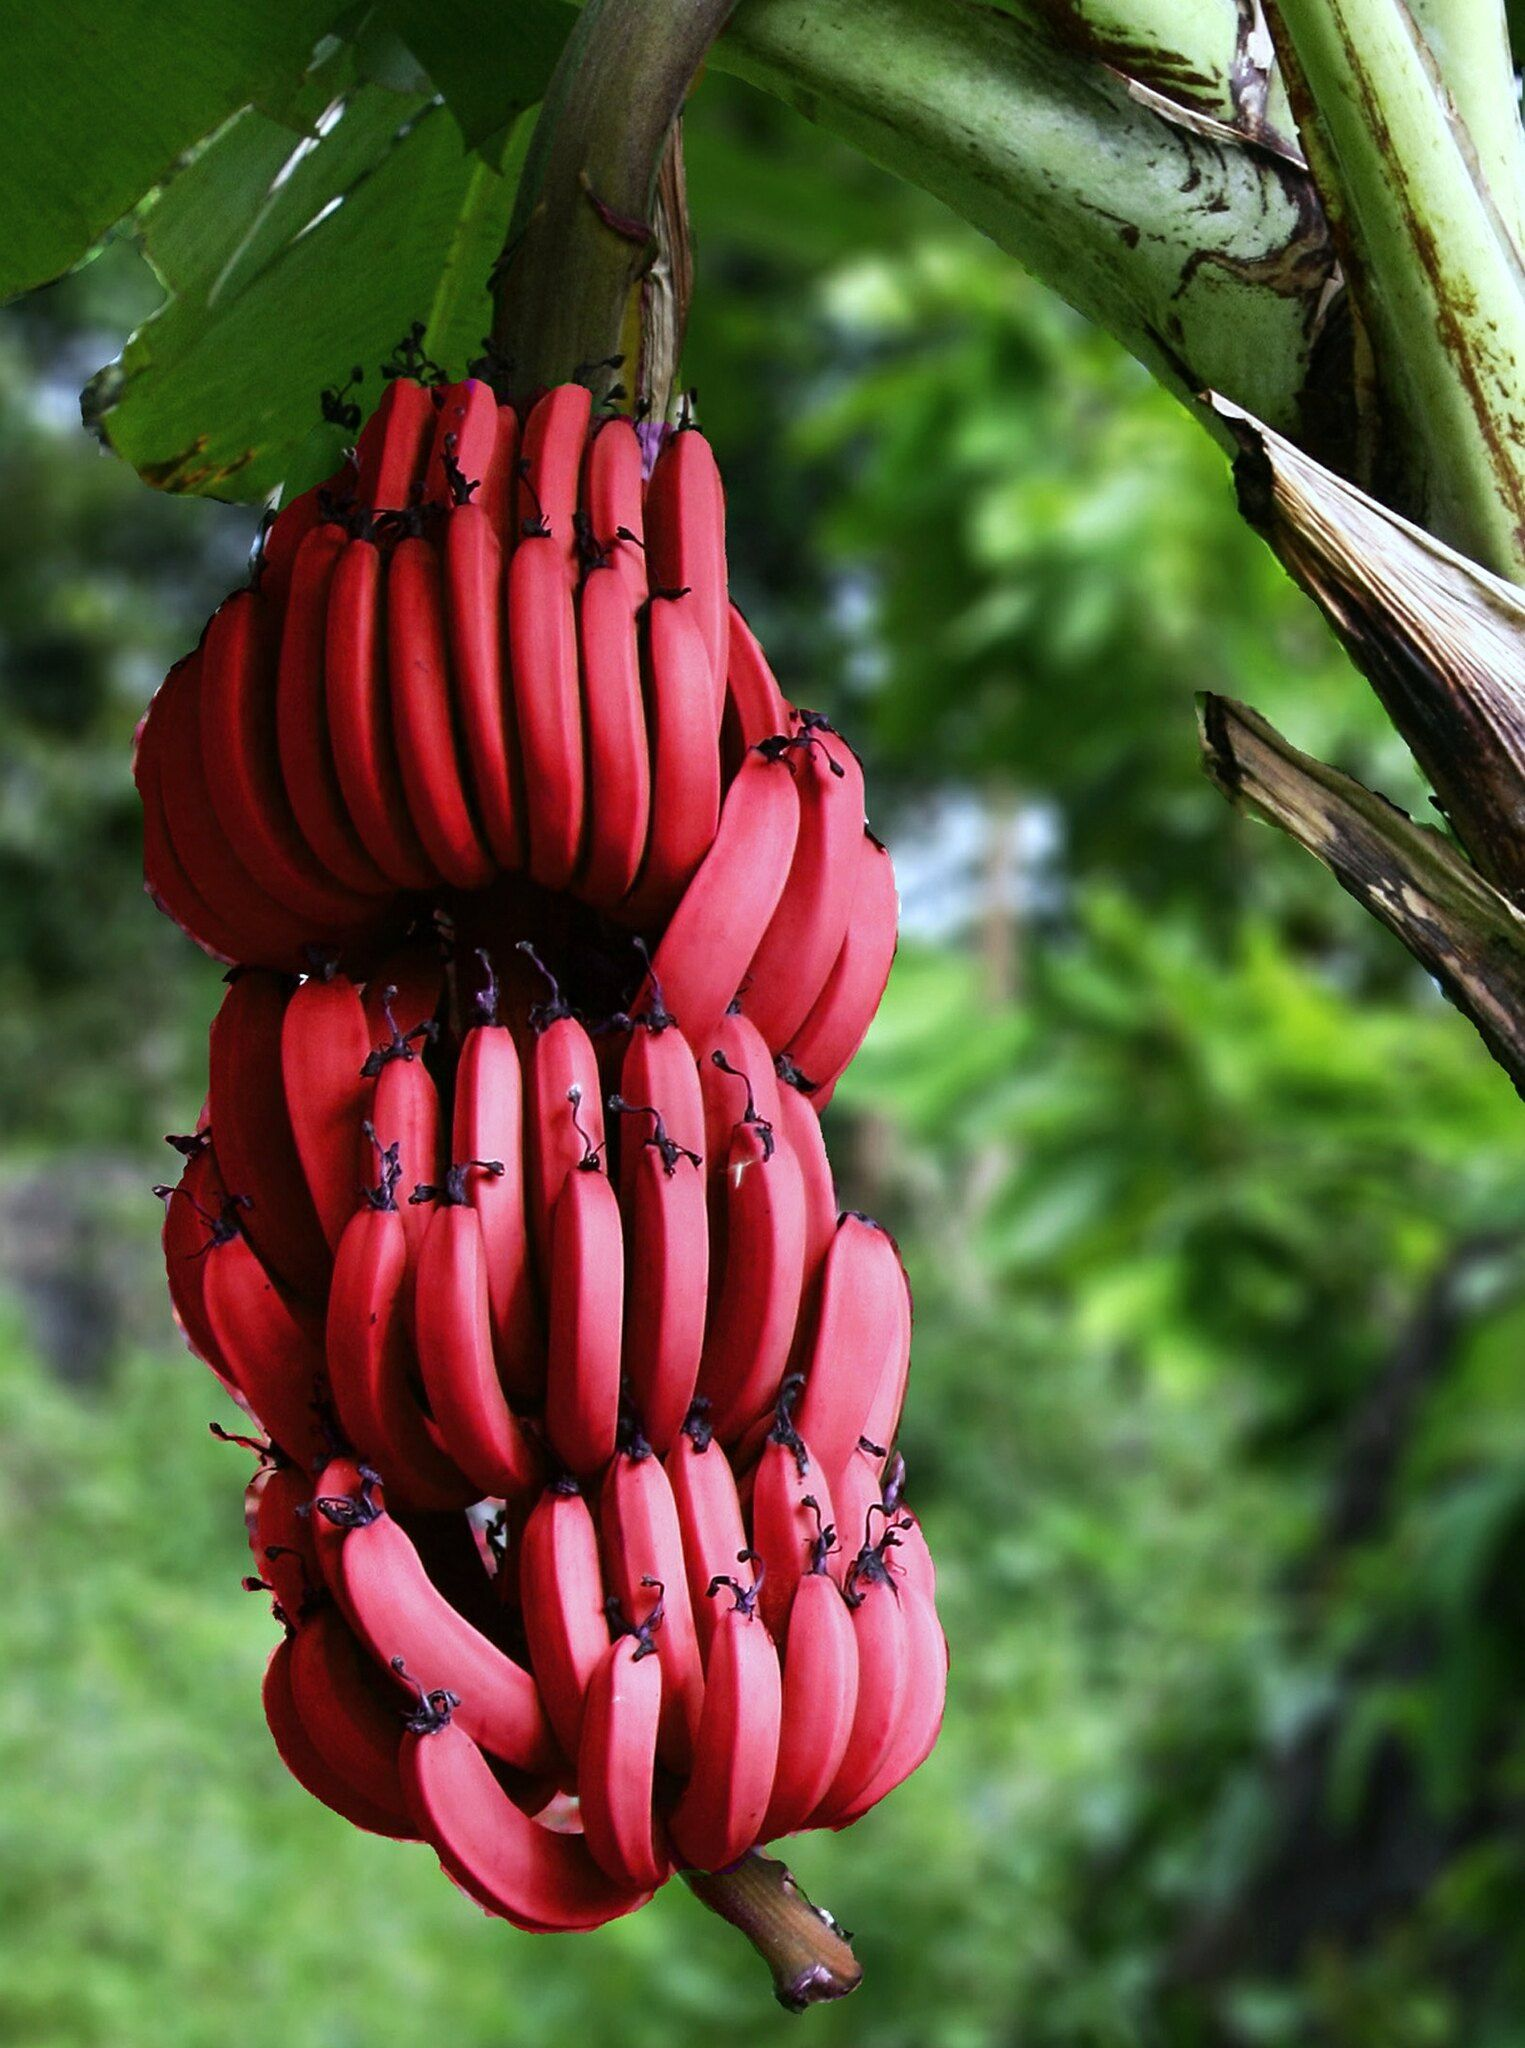 Red Bananas In 2020 With Images Red Banana Tree Banana